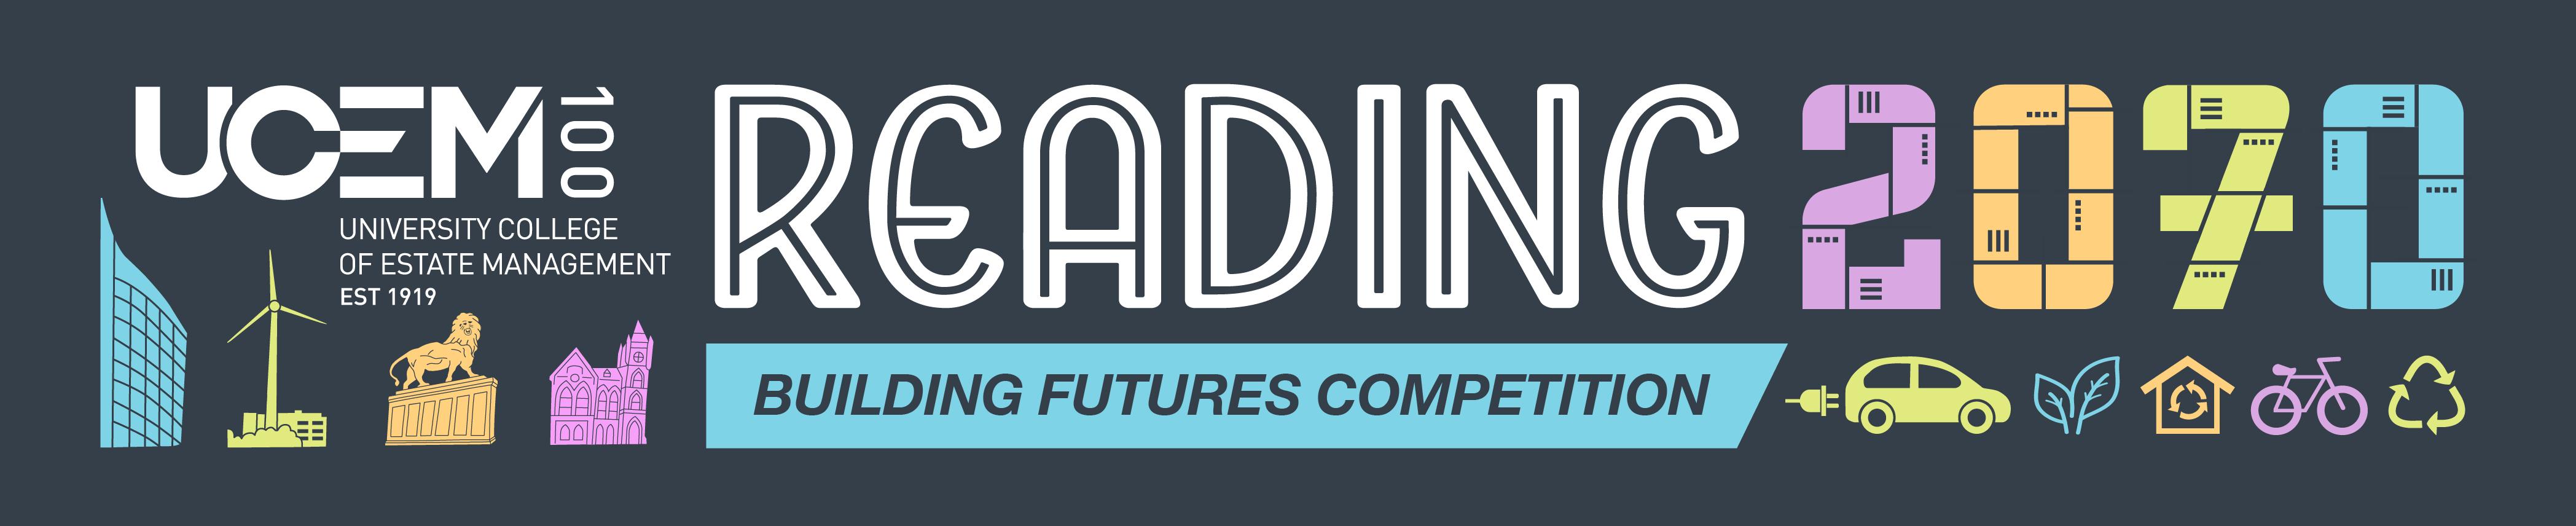 UCEM Building Futures Competition